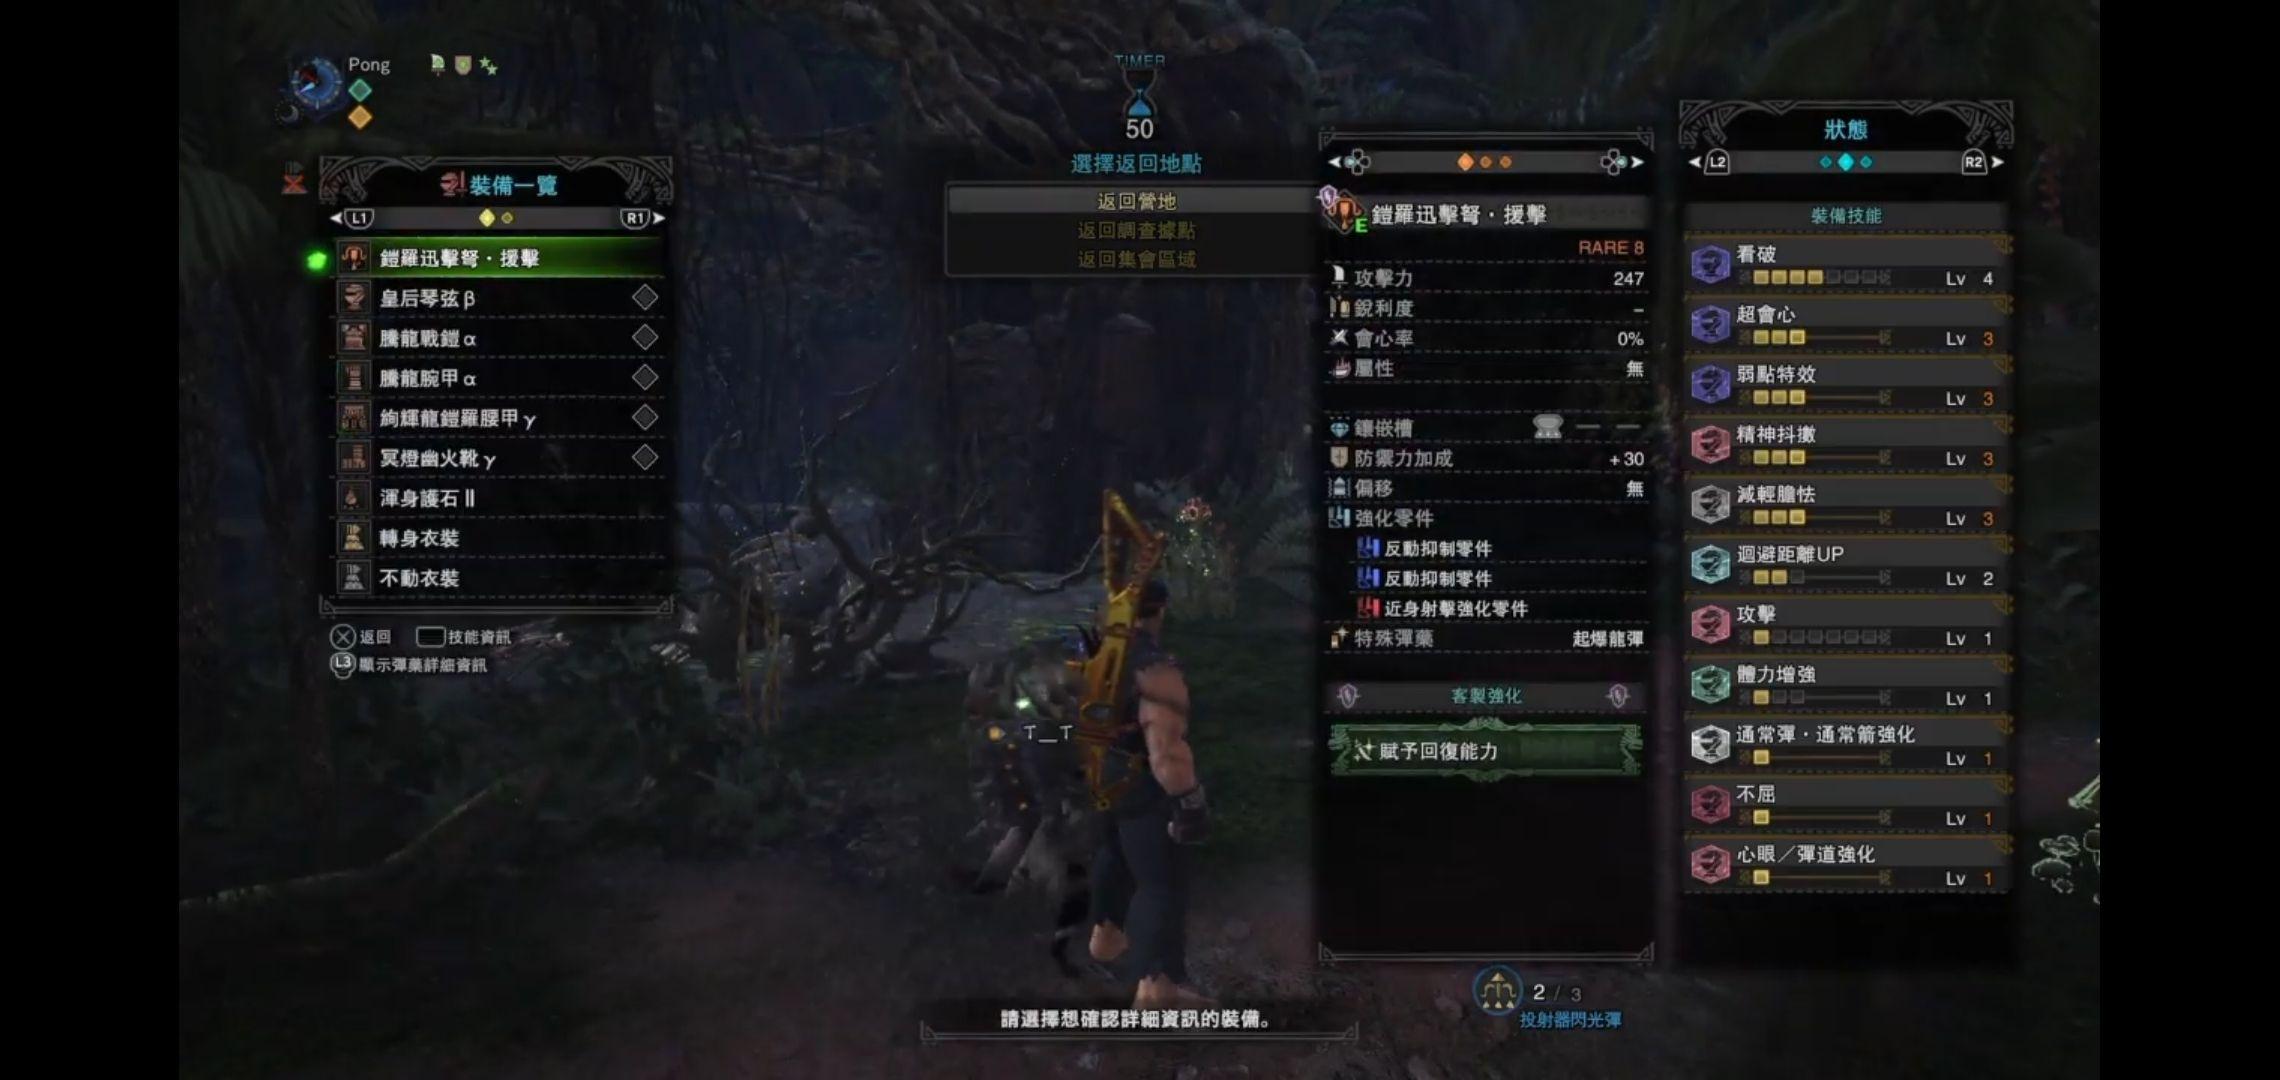 PS4/PC] Monster Hunter World [319] 齊齊組隊打樹精 | LIHKG 討論區